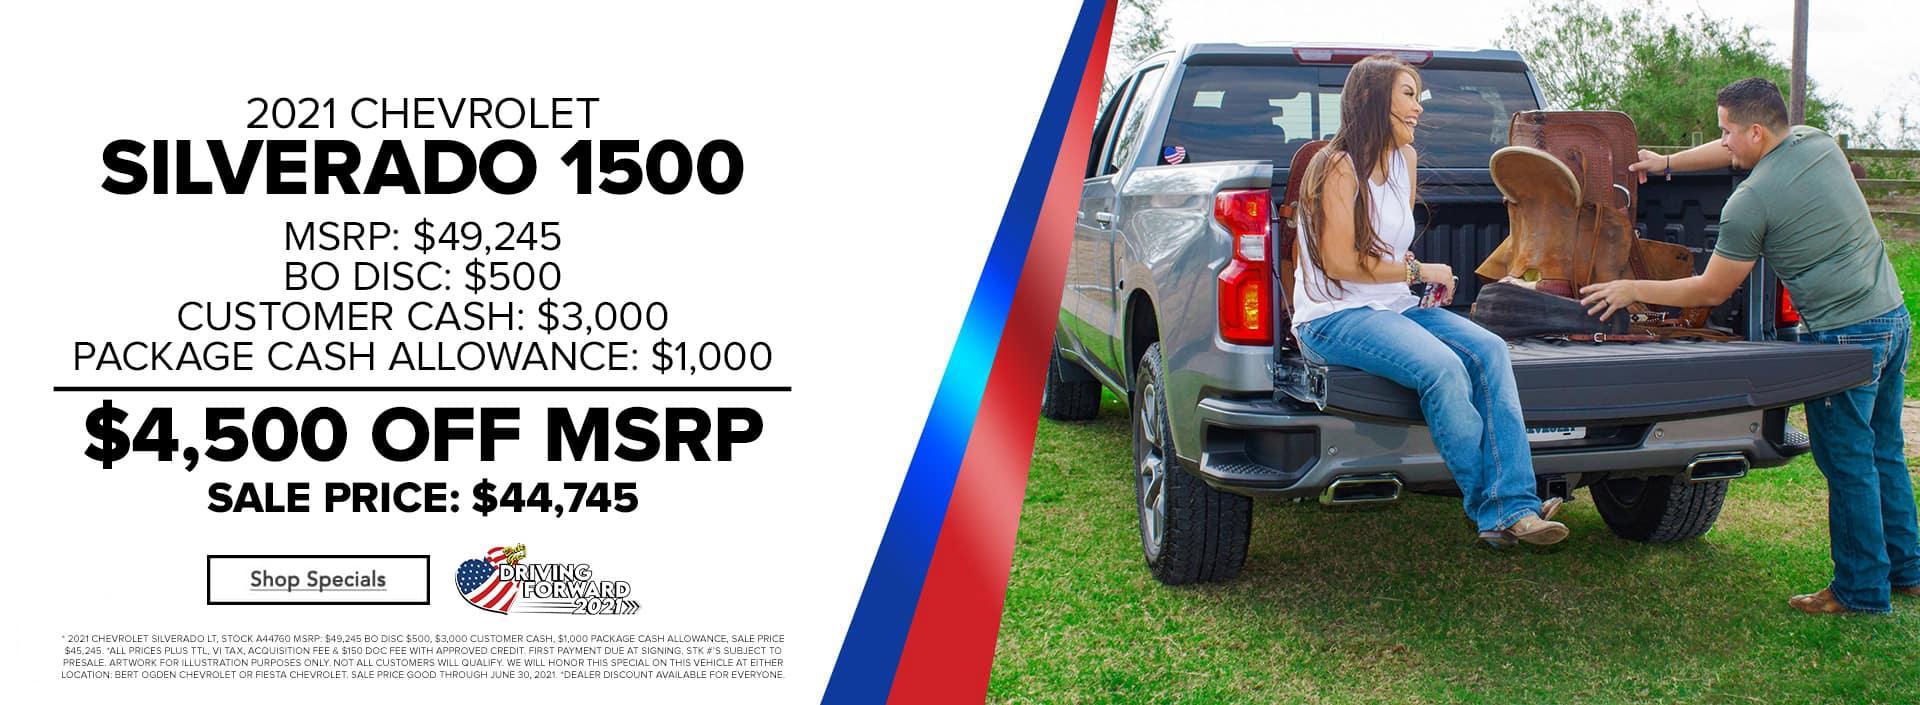 Save Thousands Off A New Chevrolet Silverado 1500 | Bert Ogden Auto Group